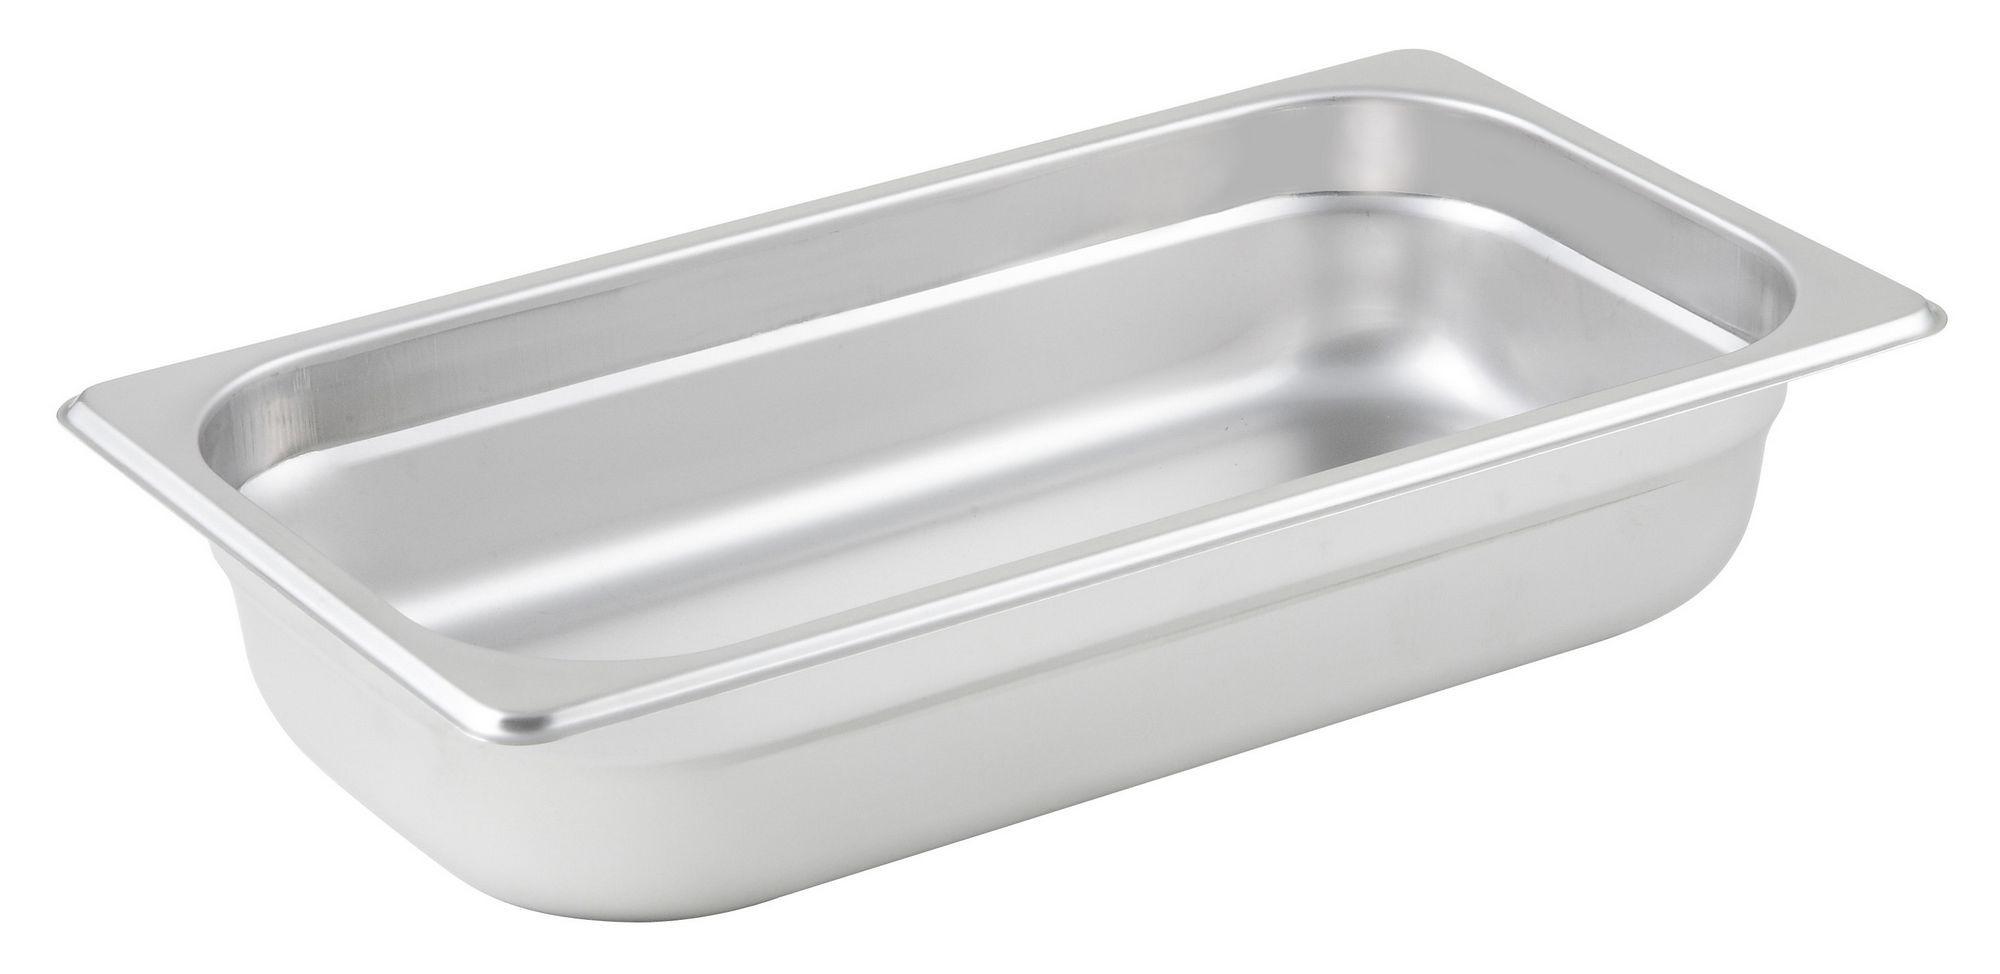 "Winco SPJM-302 1/3 Size Anti-Jam 24 Gauge Steam Table Pan 2-1/2"" Deep"